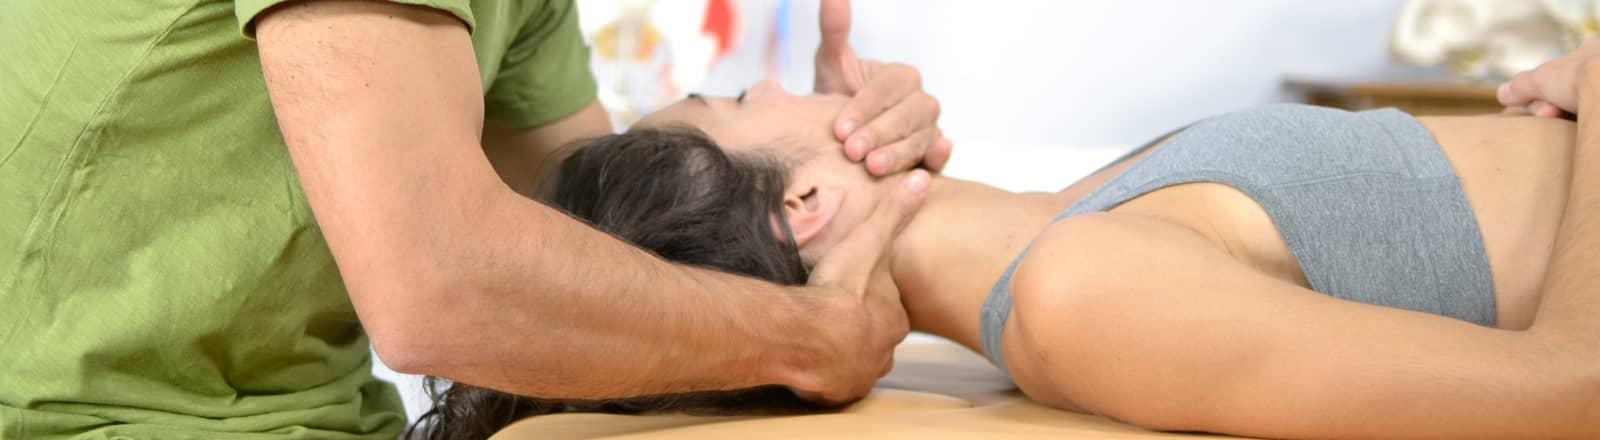 fisioterapia visceral Logroño